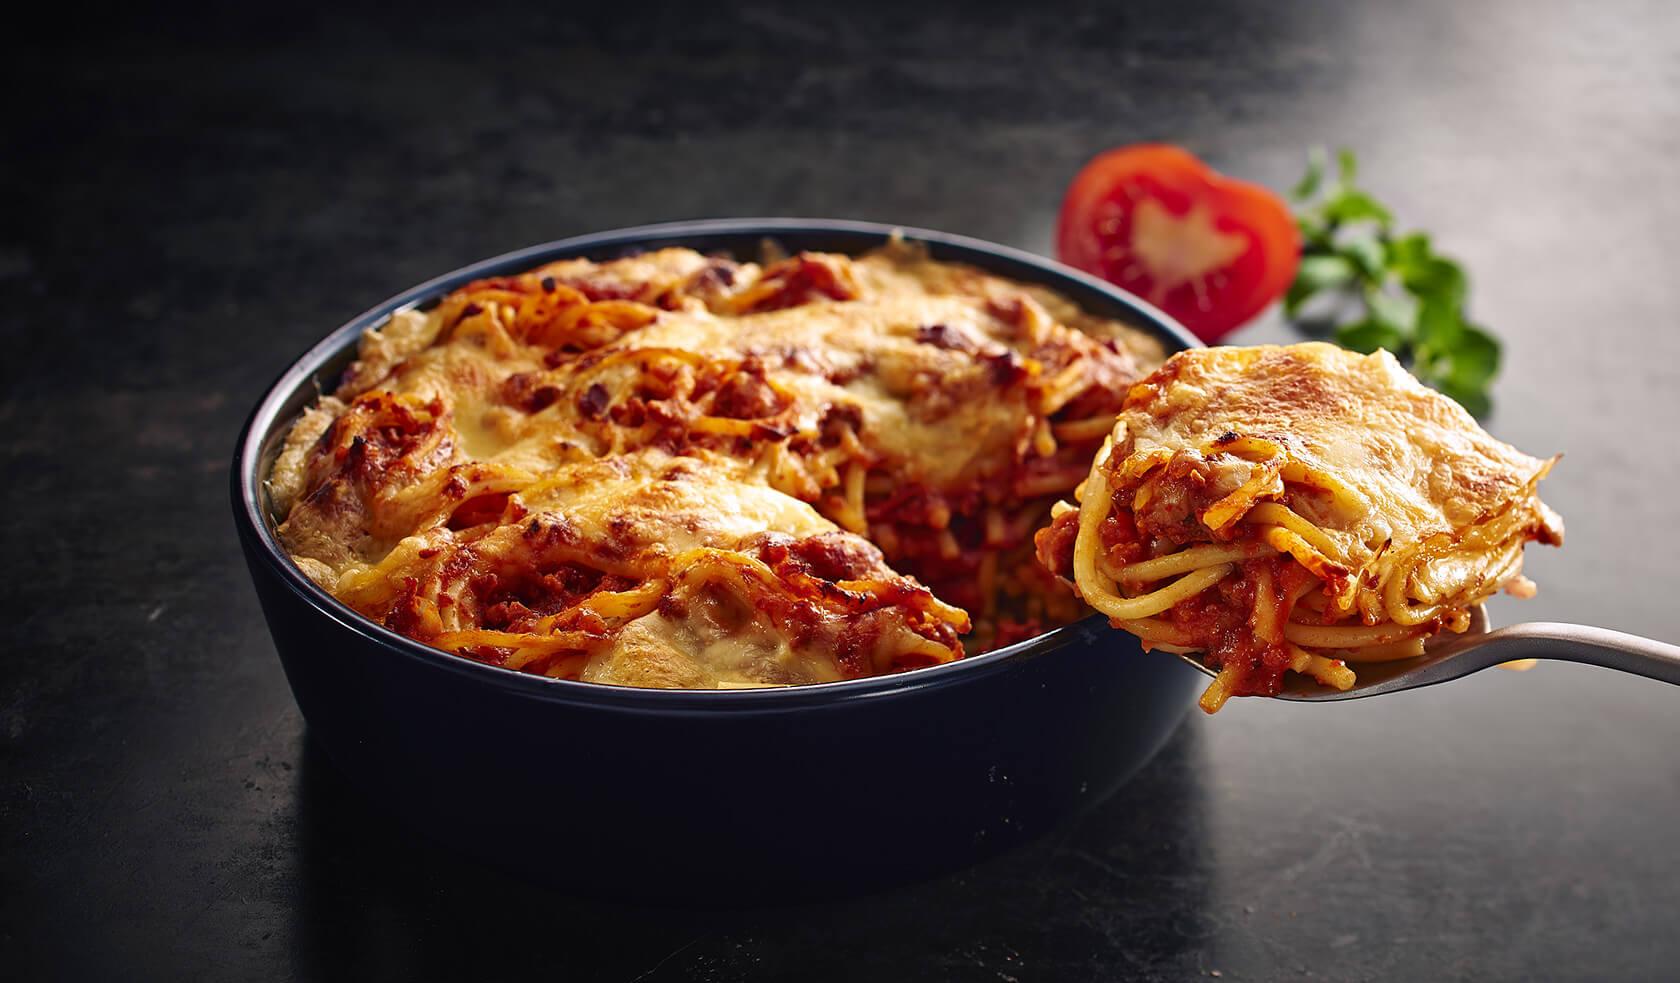 Kidzz Spaghetti Bolognese